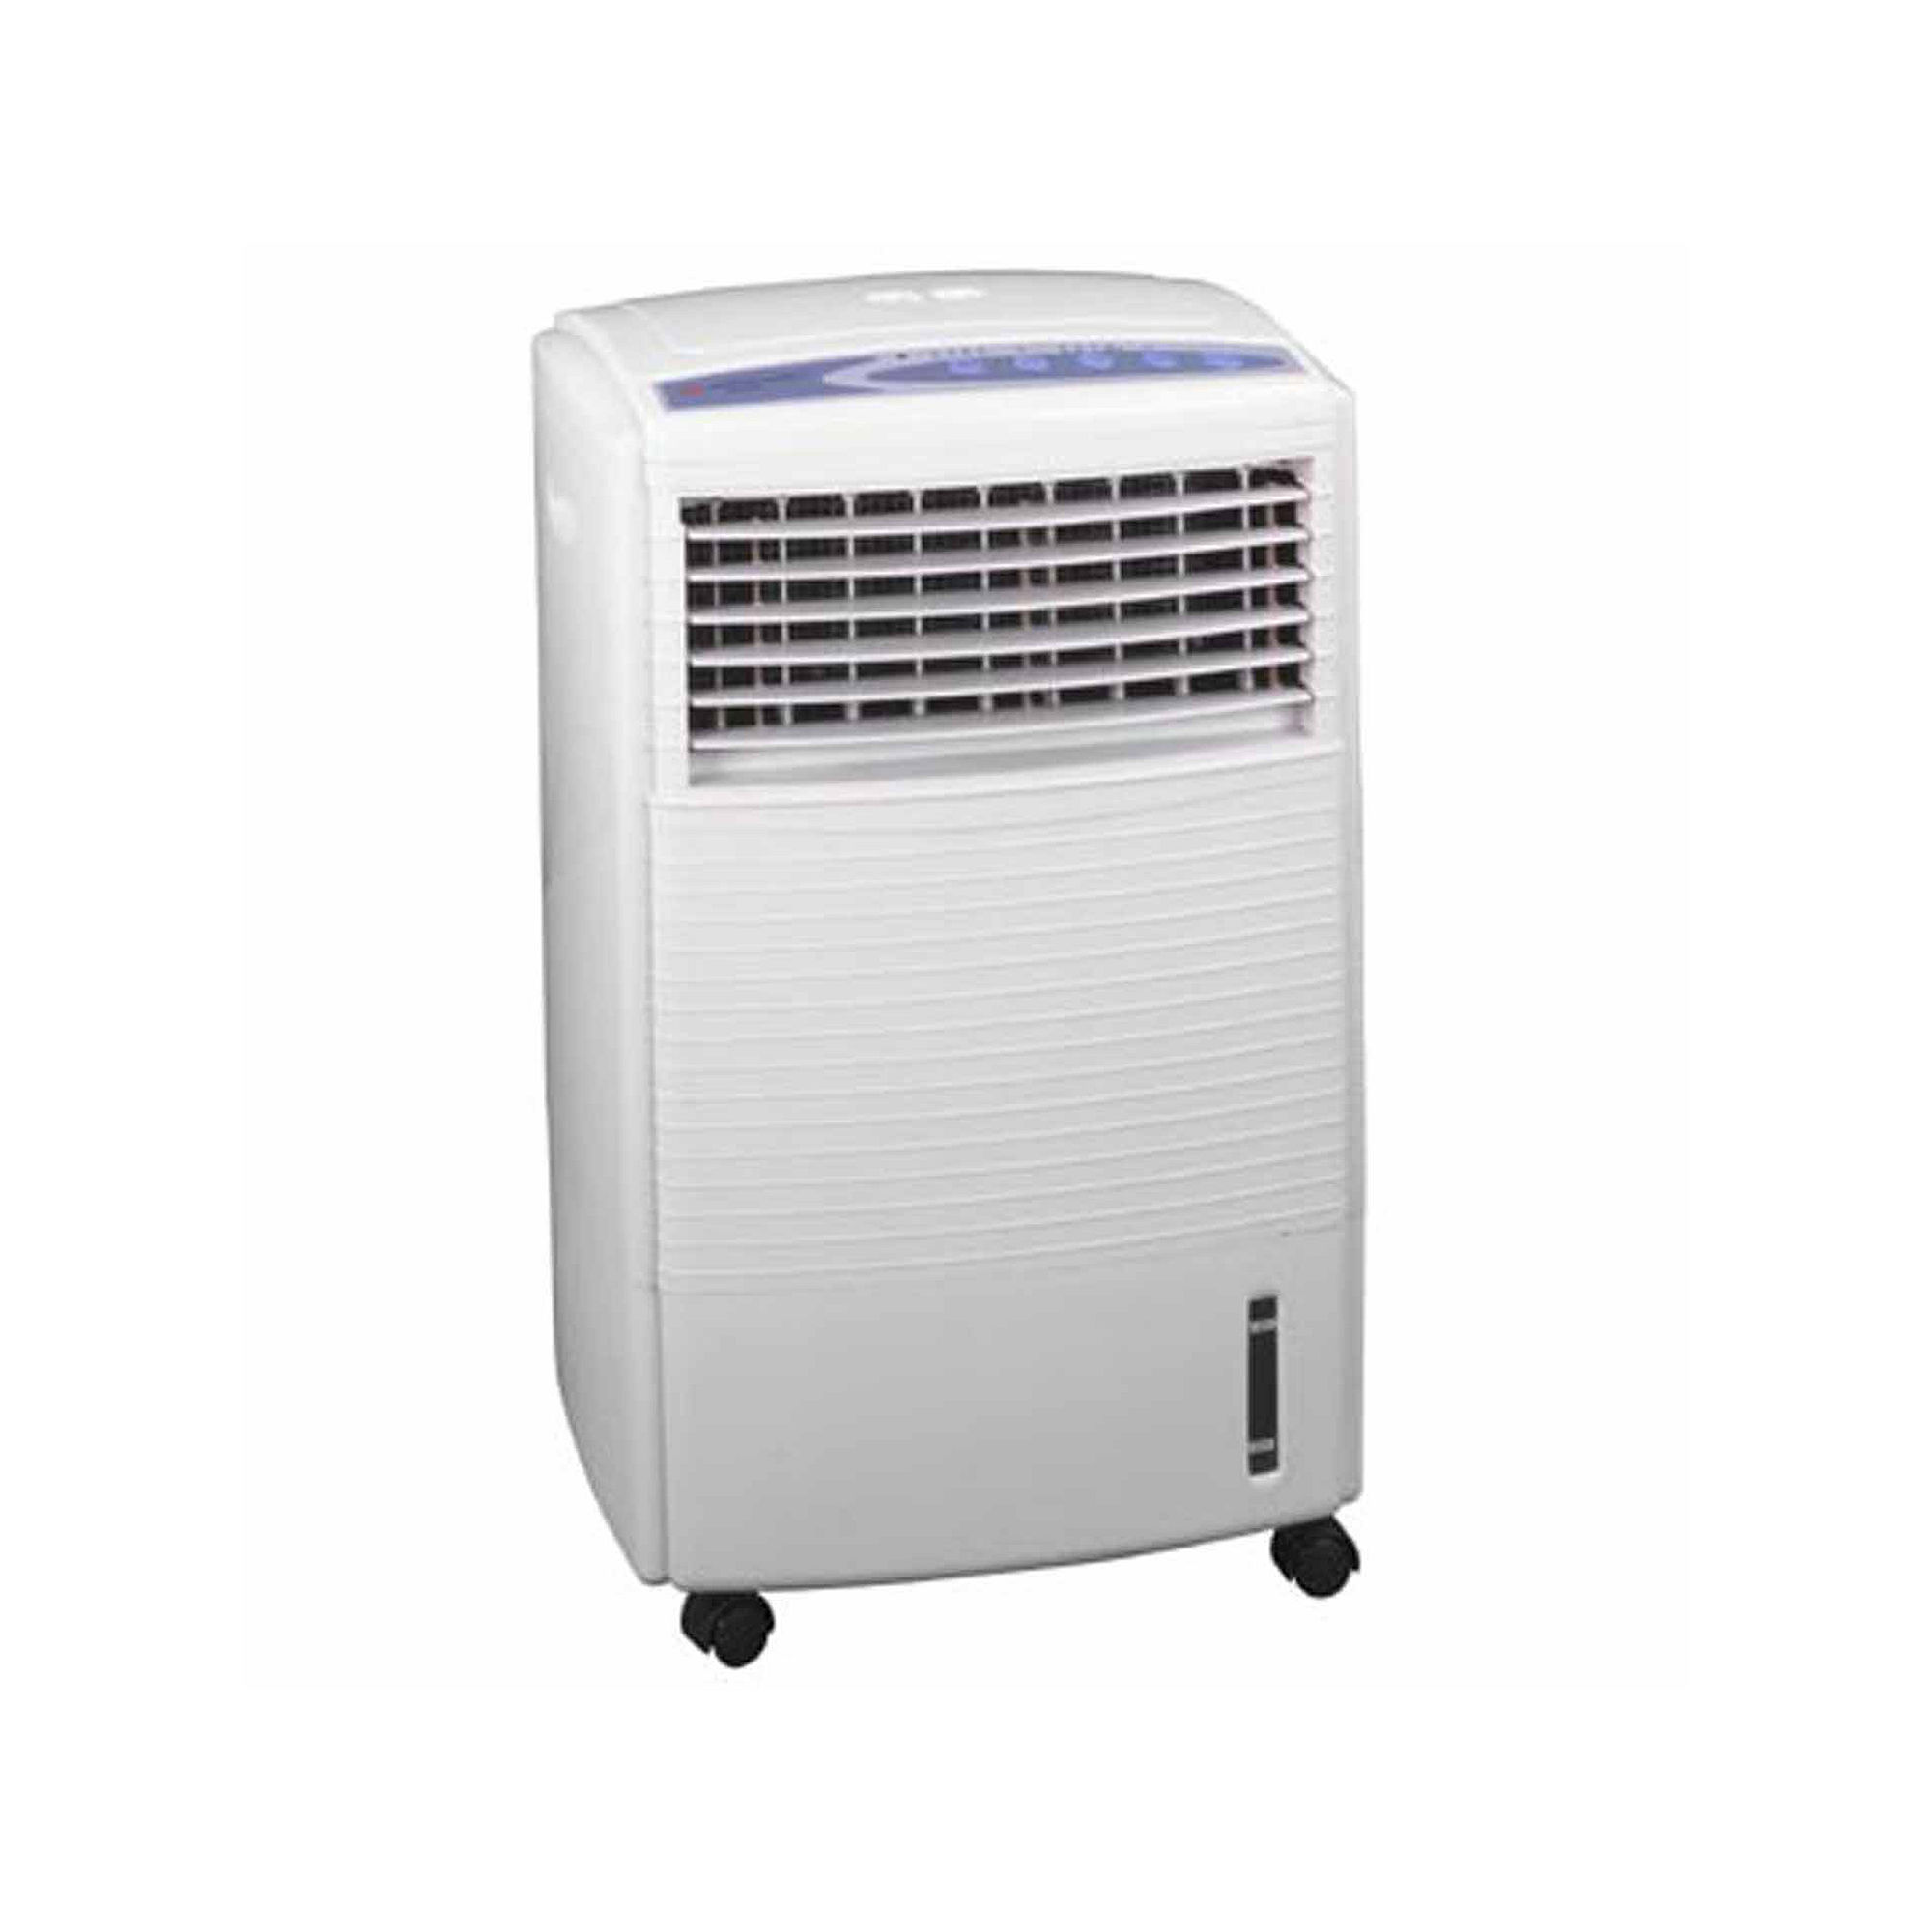 SPT SF-608R/RA: Evaporative Air Cooler